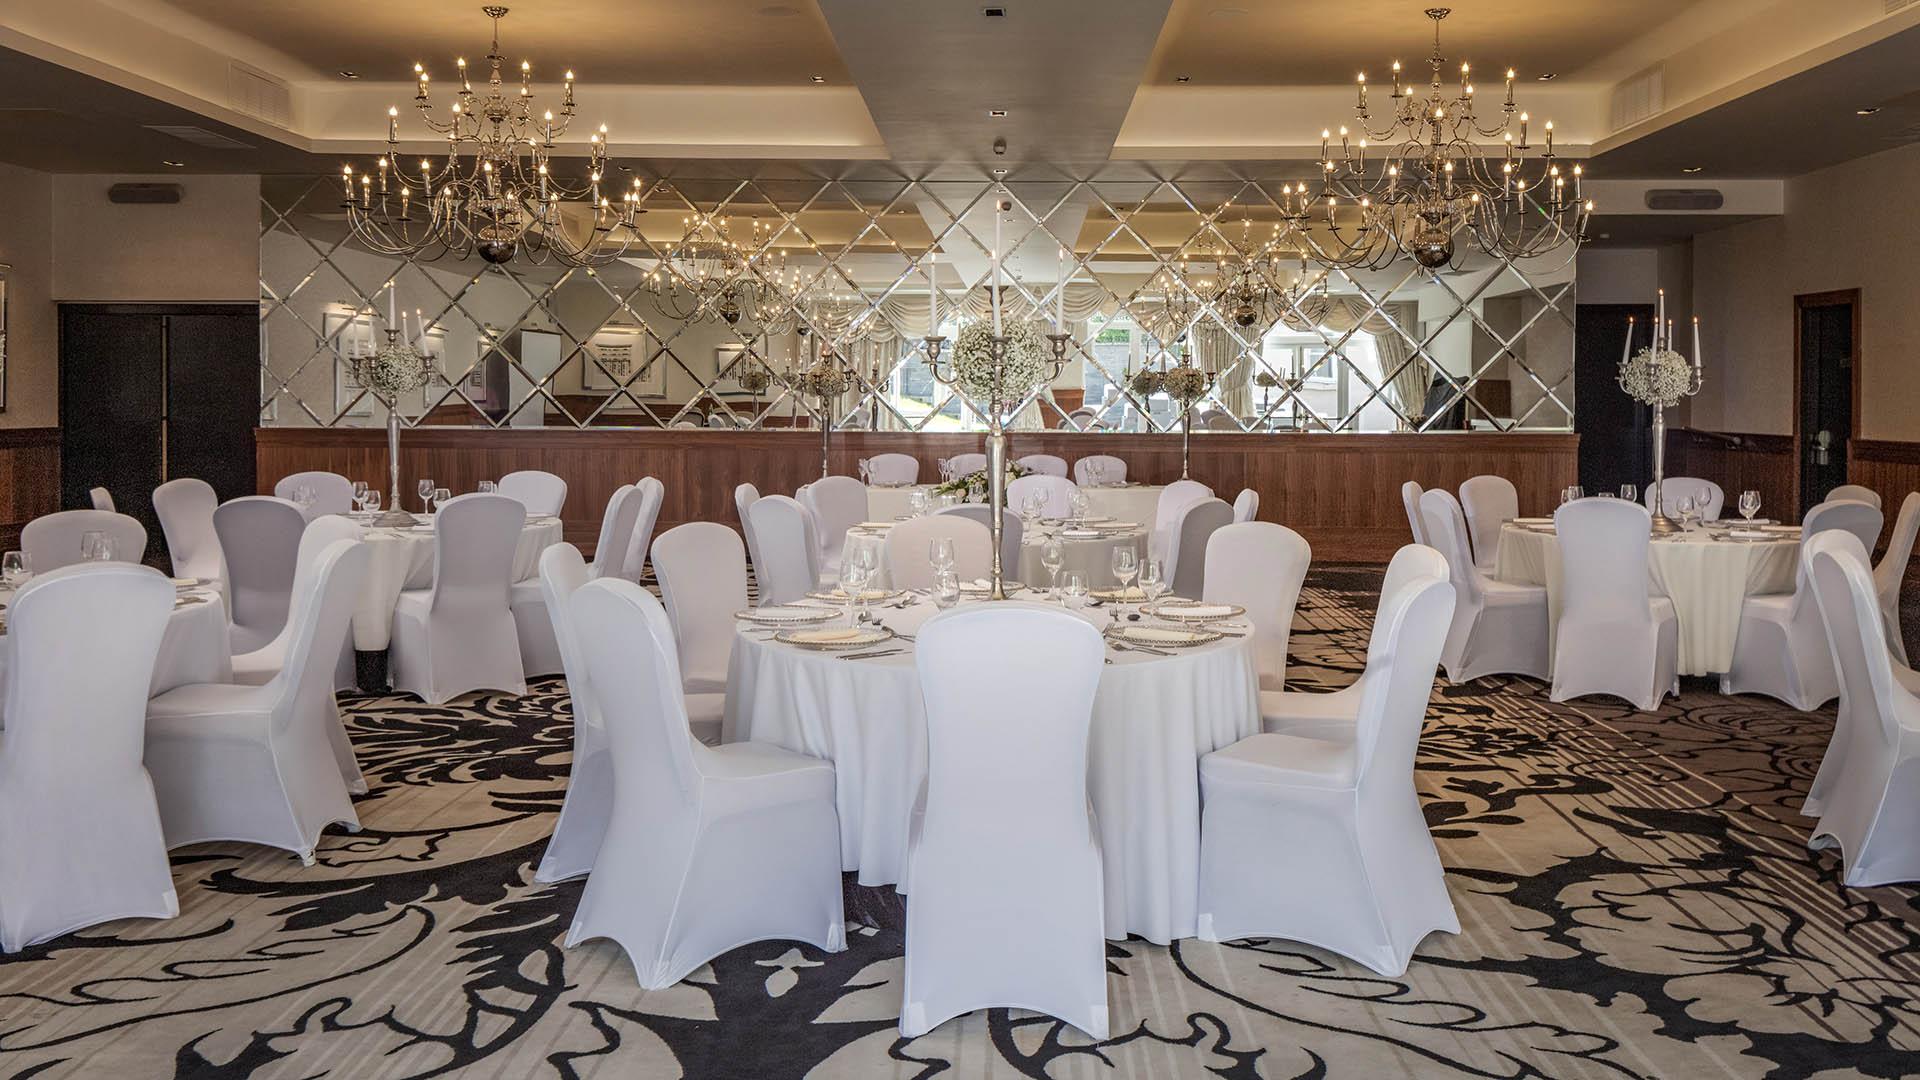 hotelcolessio_Wedding_Ballroom_1920x600